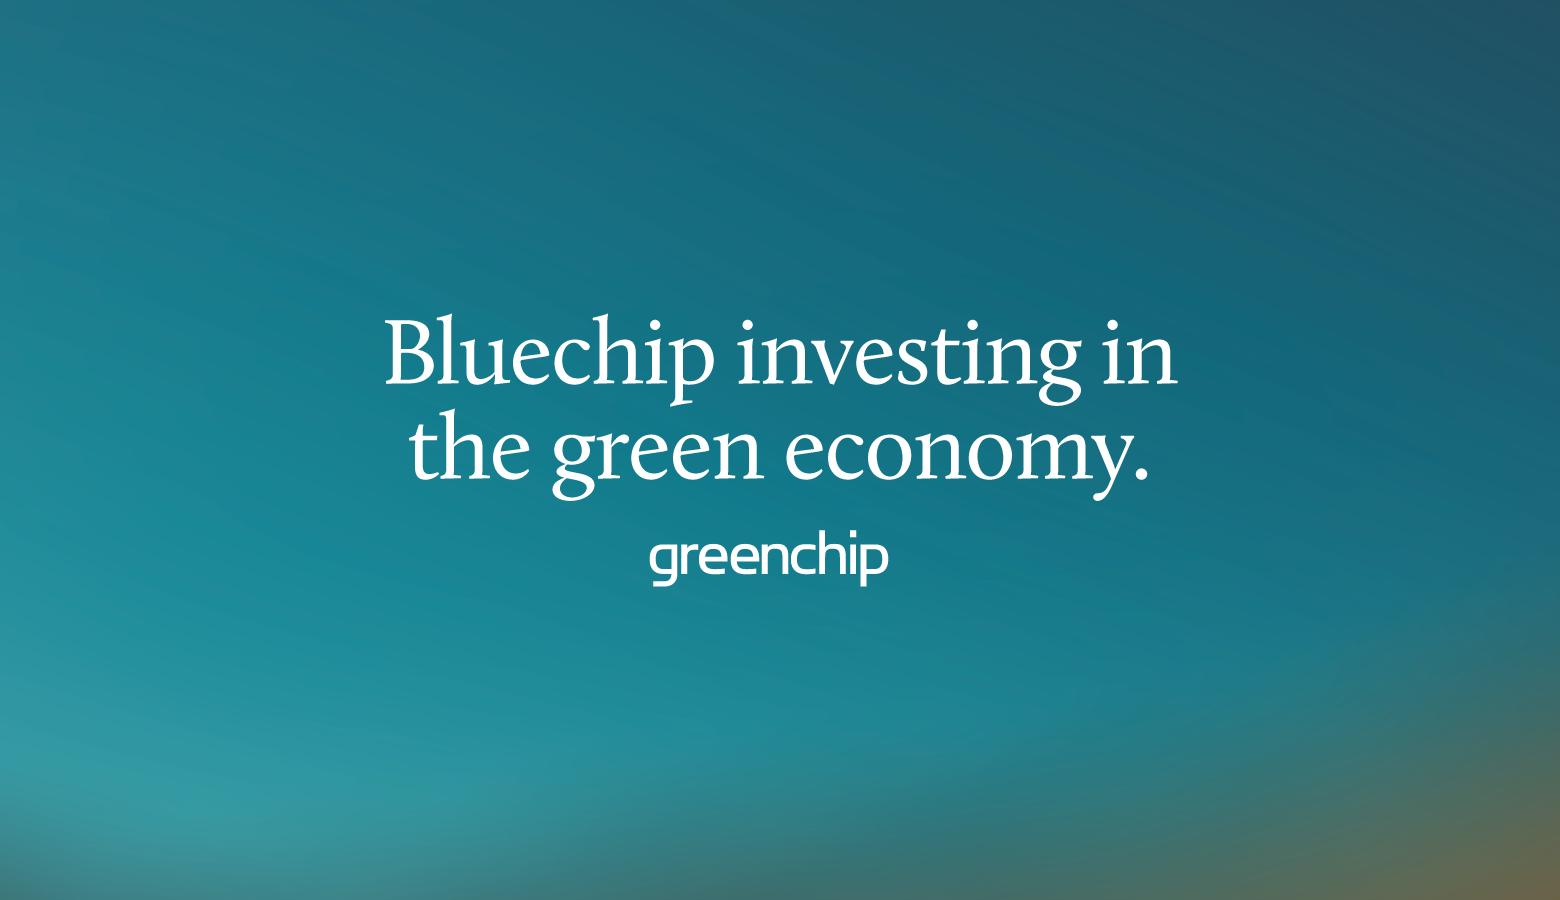 Greenchip Financial